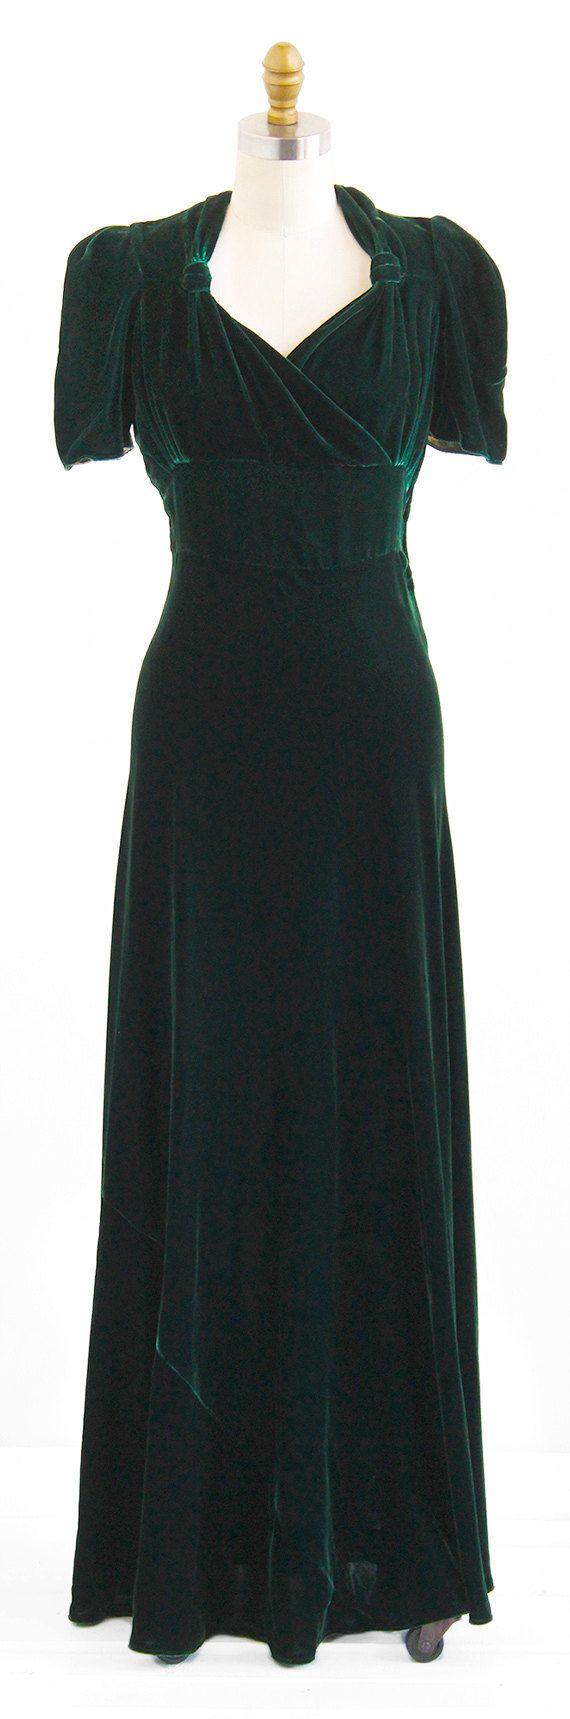 / 30s gown / Green Silk Velvet Art Deco Evening Gown